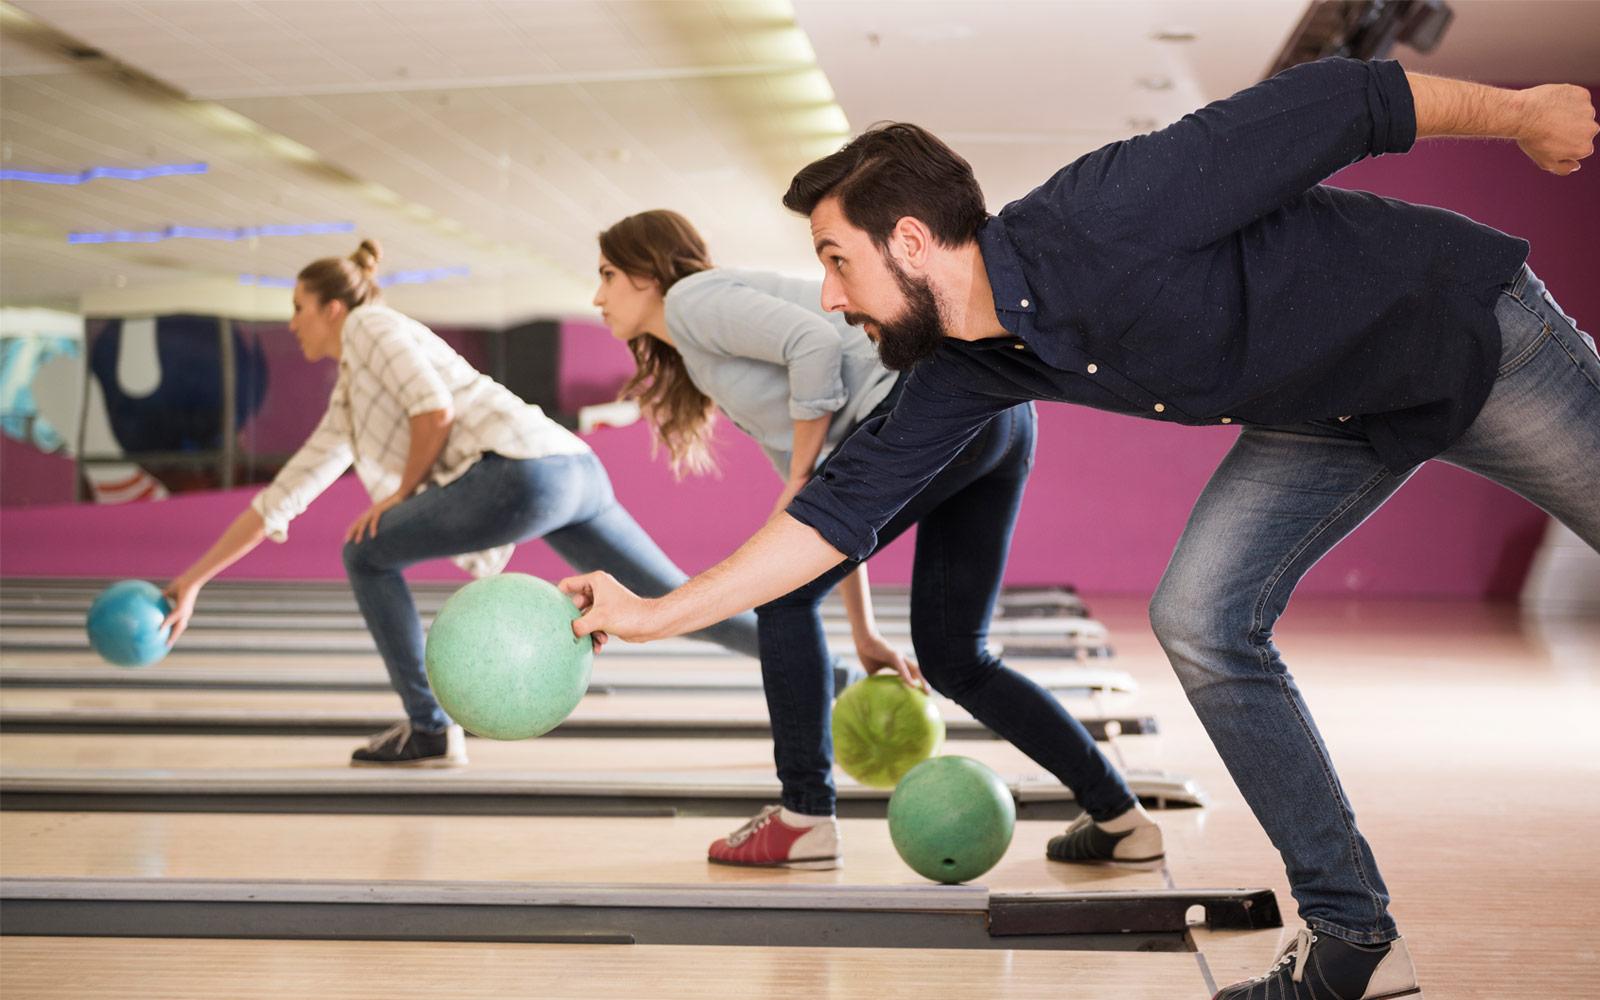 ultra modern bowling alley in macon ga pin strikes